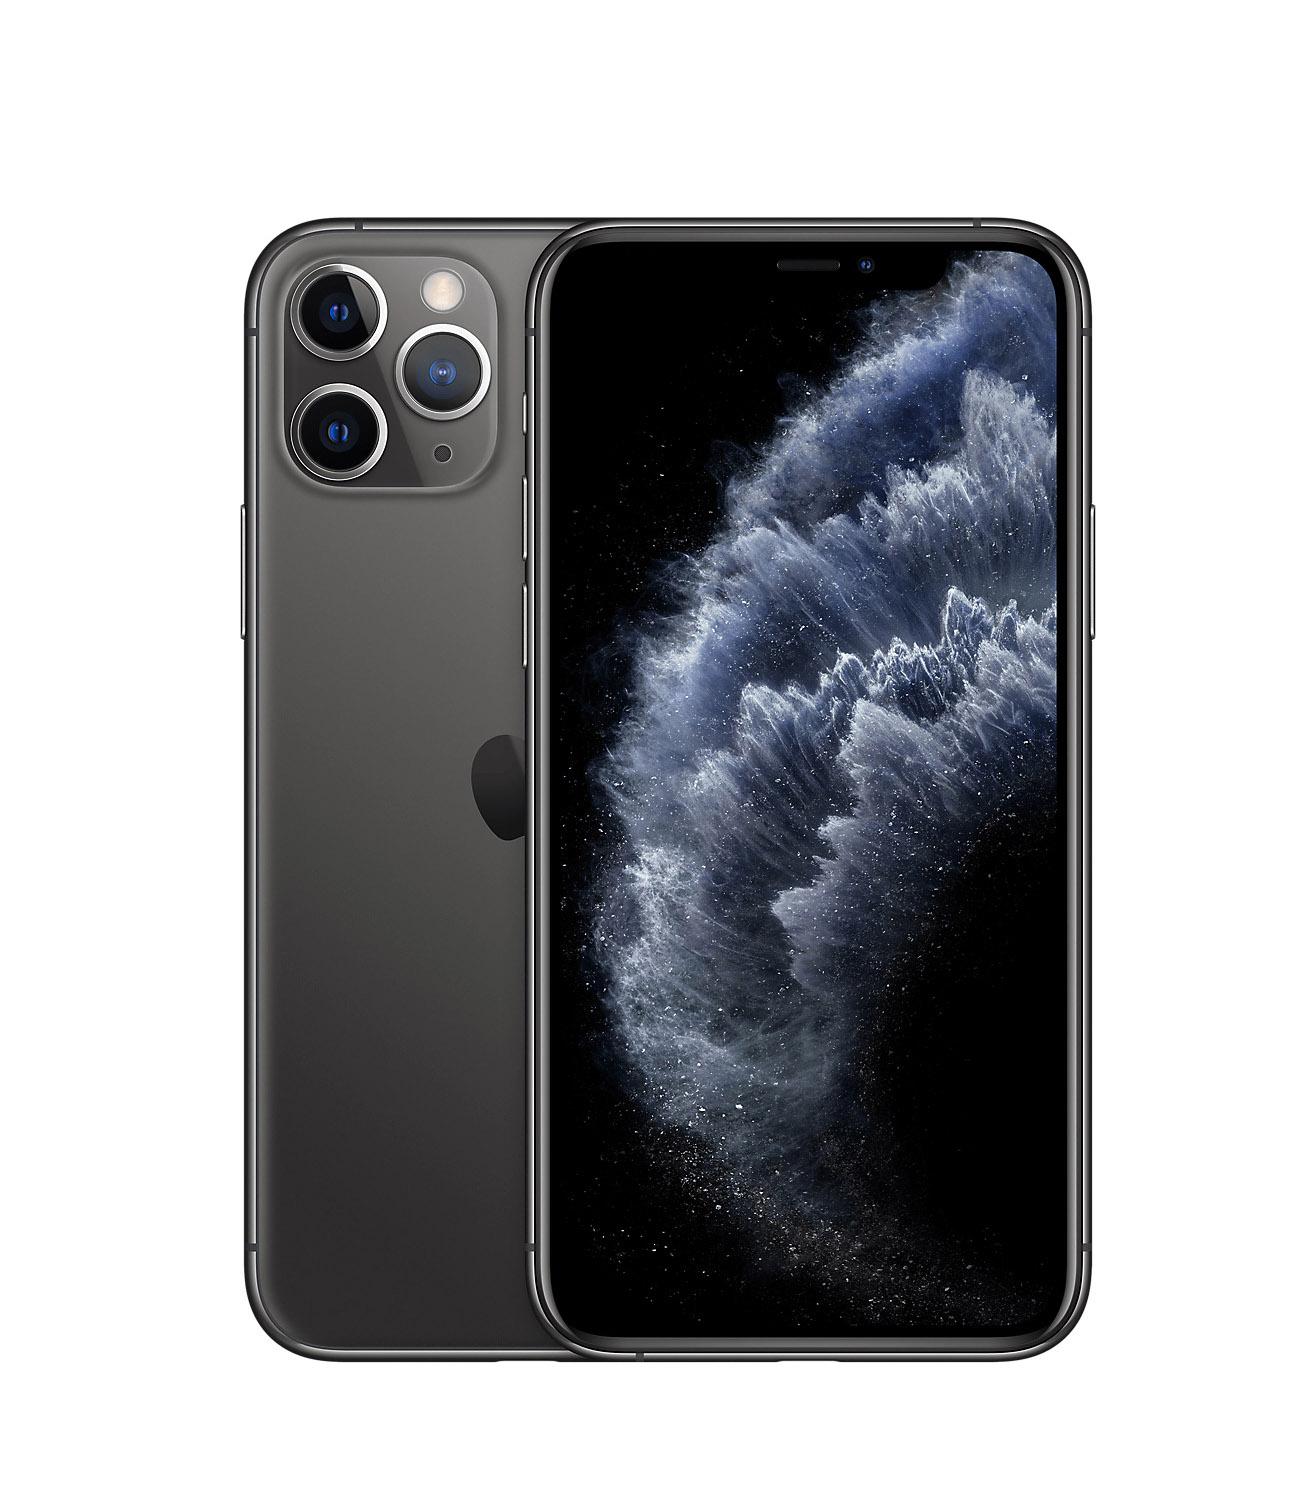 Apple iPhone 11 PRO 64GB Grey Πληρωμή έως 24 δόσεις